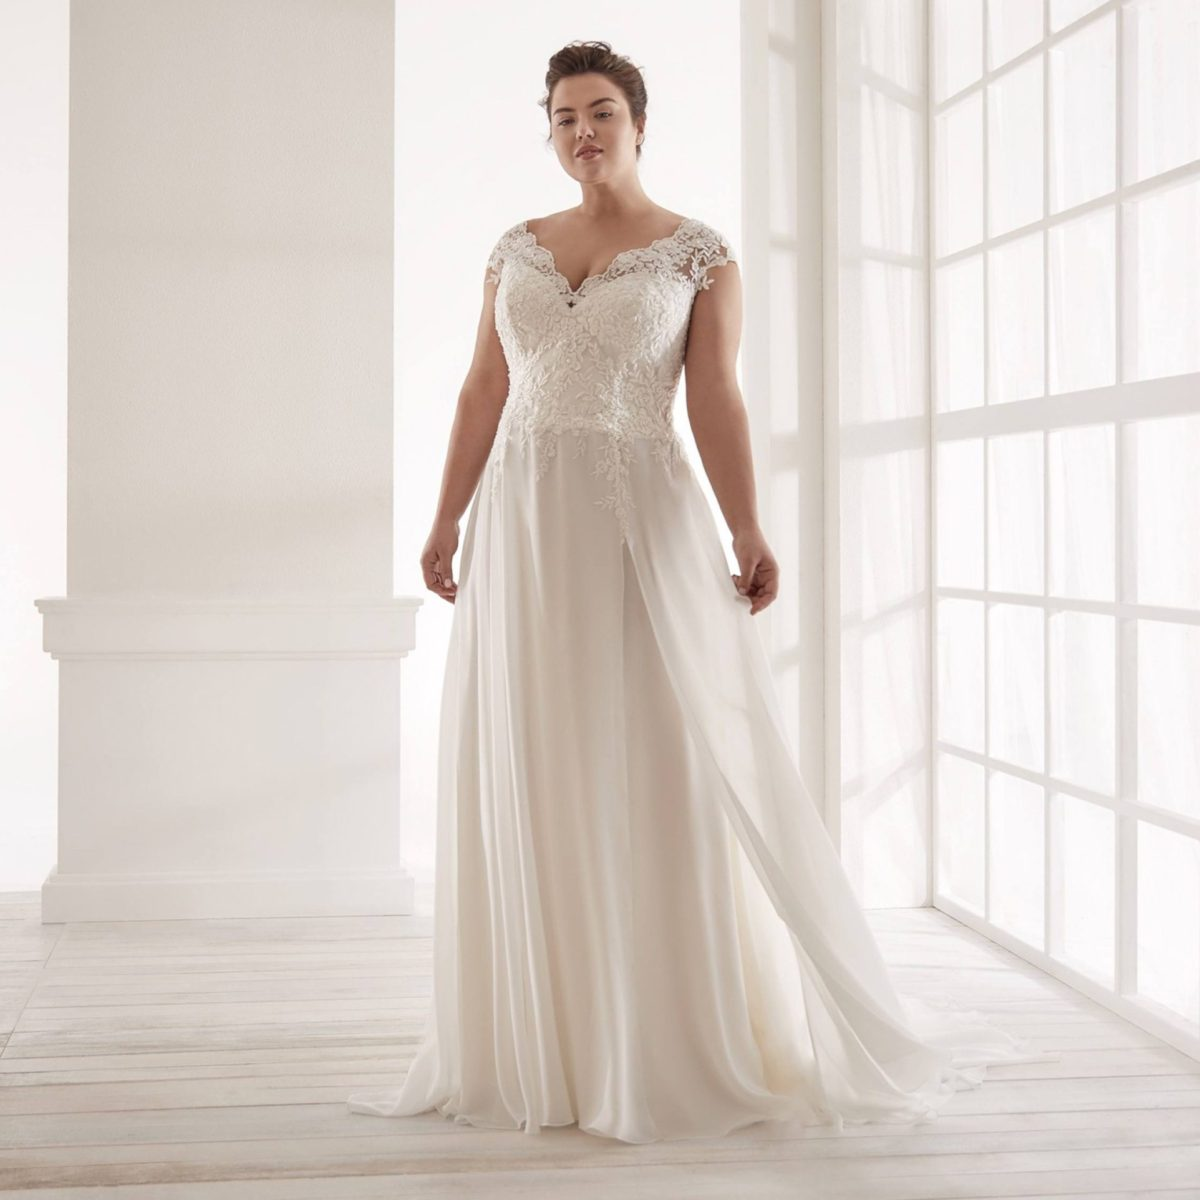 Elizabeth-Bridal-Nicole-Curves-20151